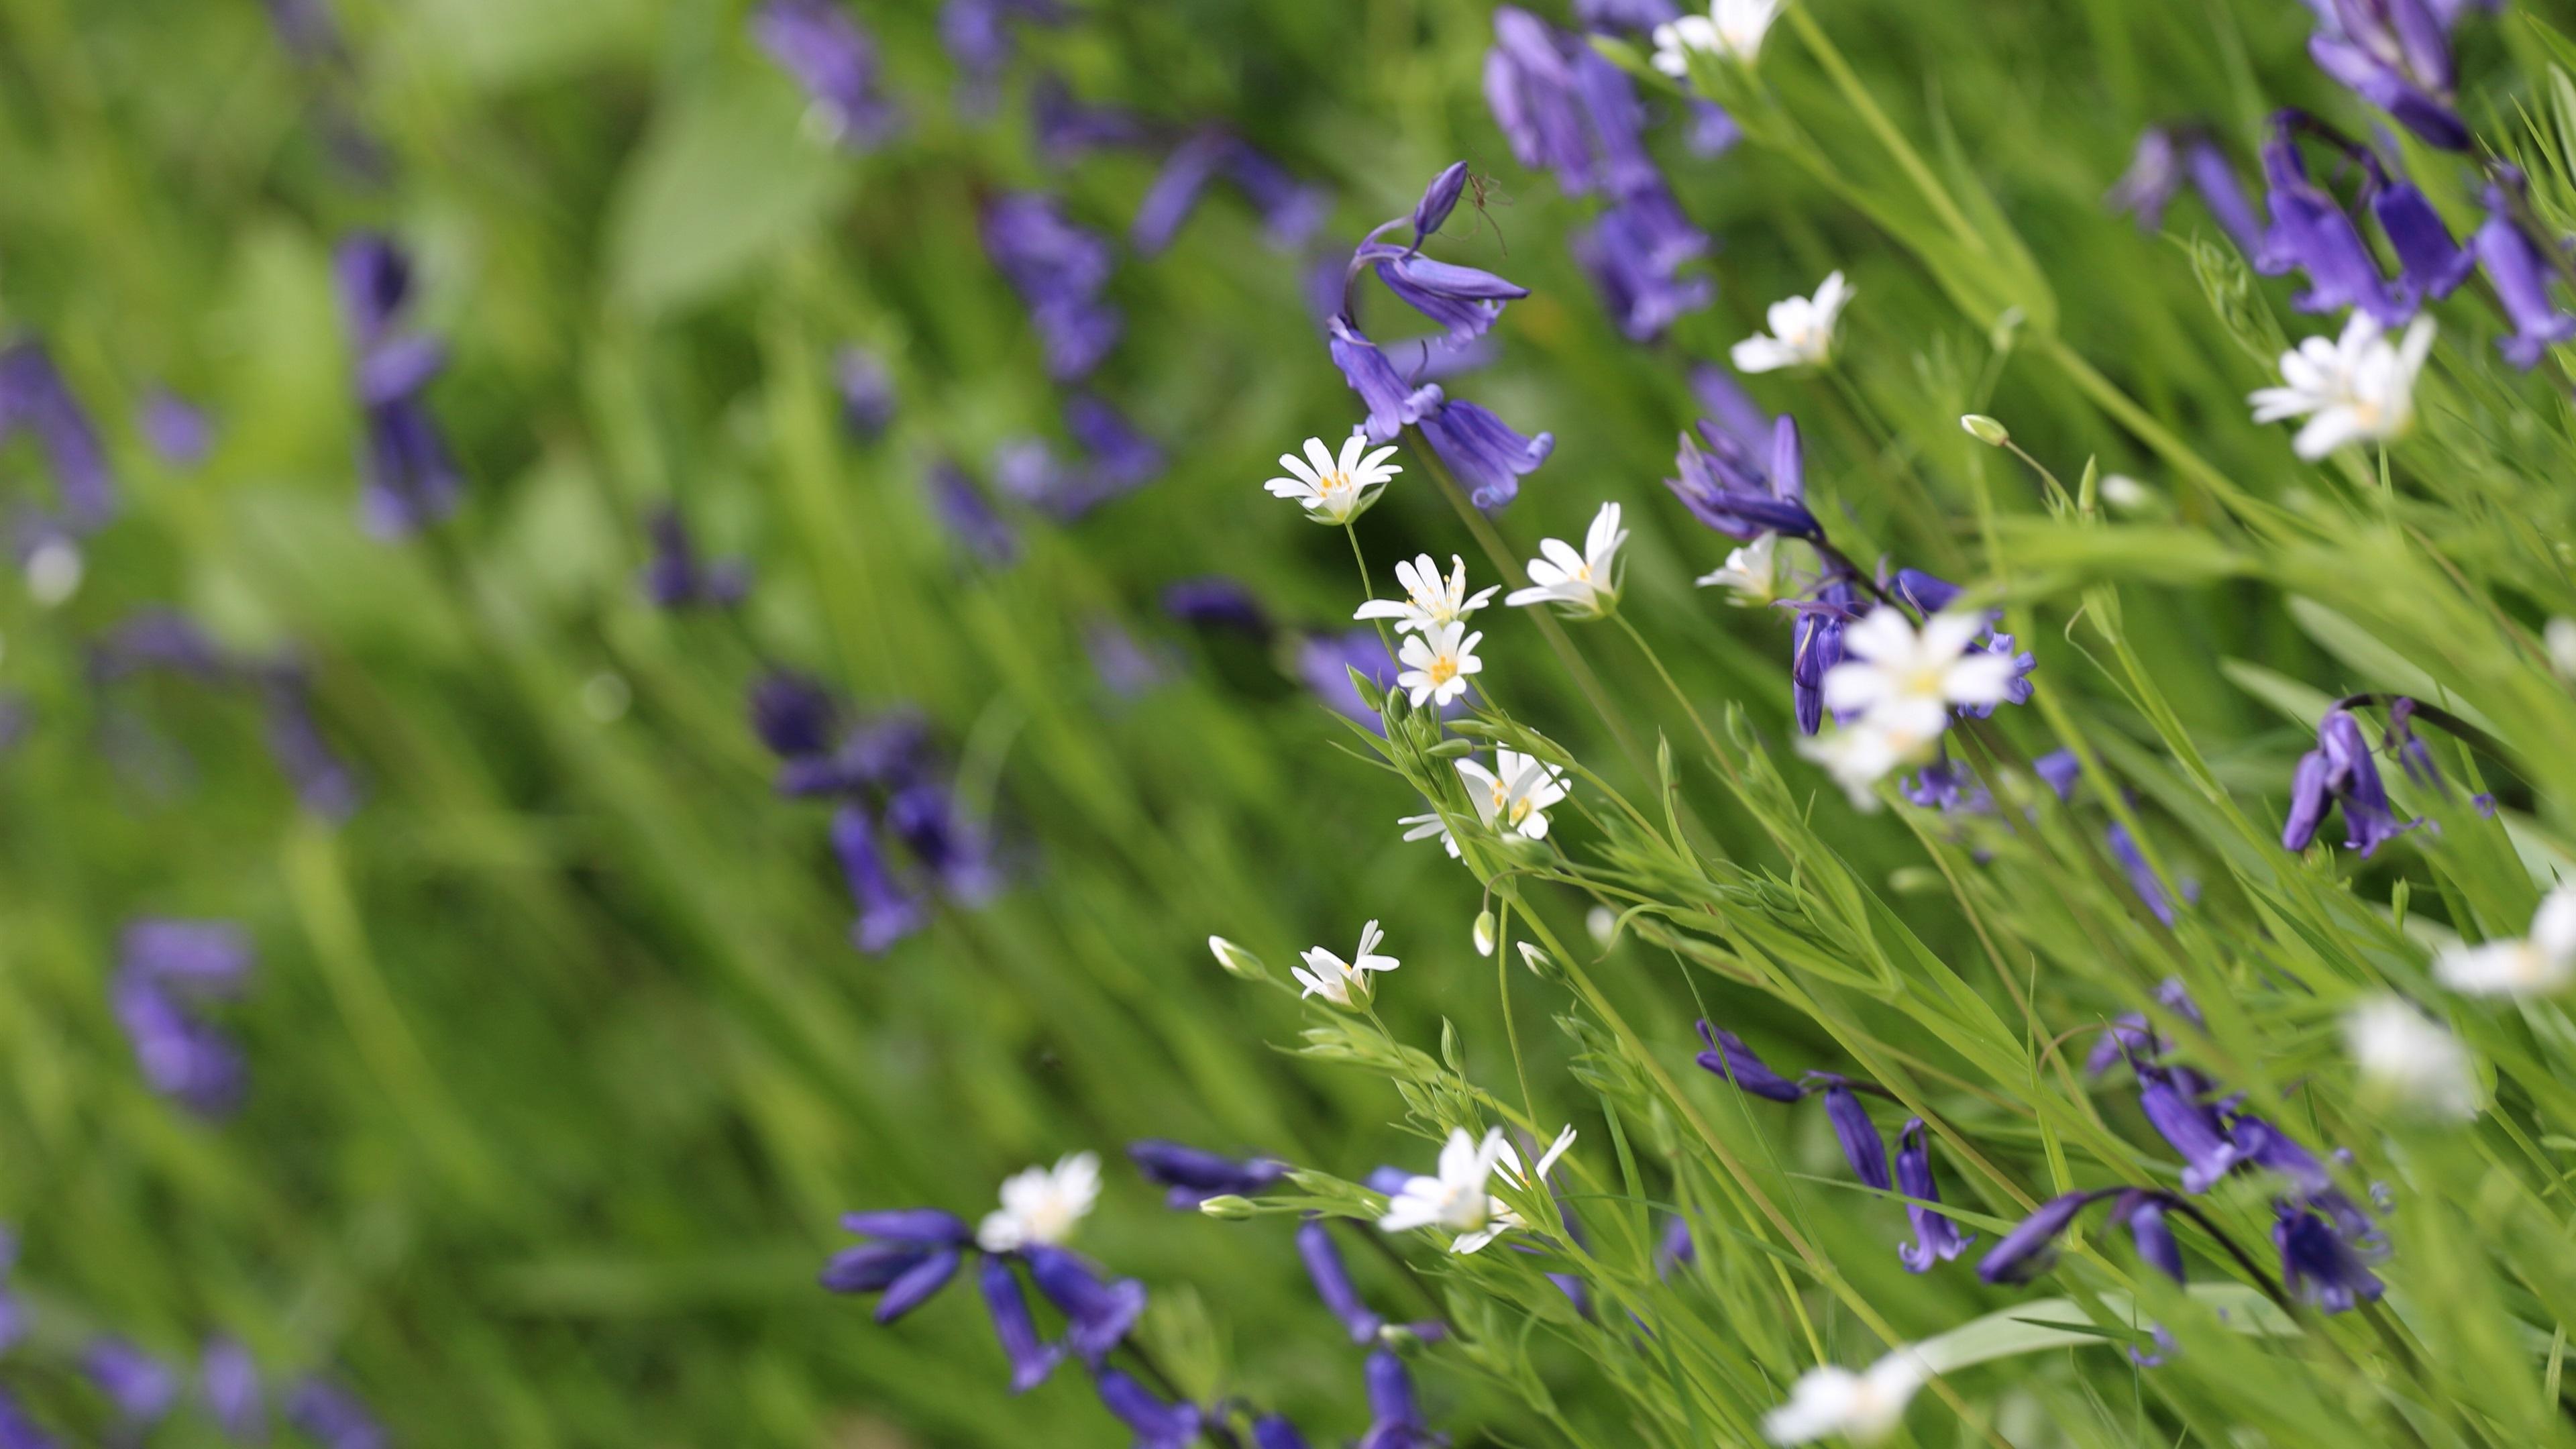 Fondos De Pantalla Flores Silvestres Blancas Y Azules 3840x2160 Uhd